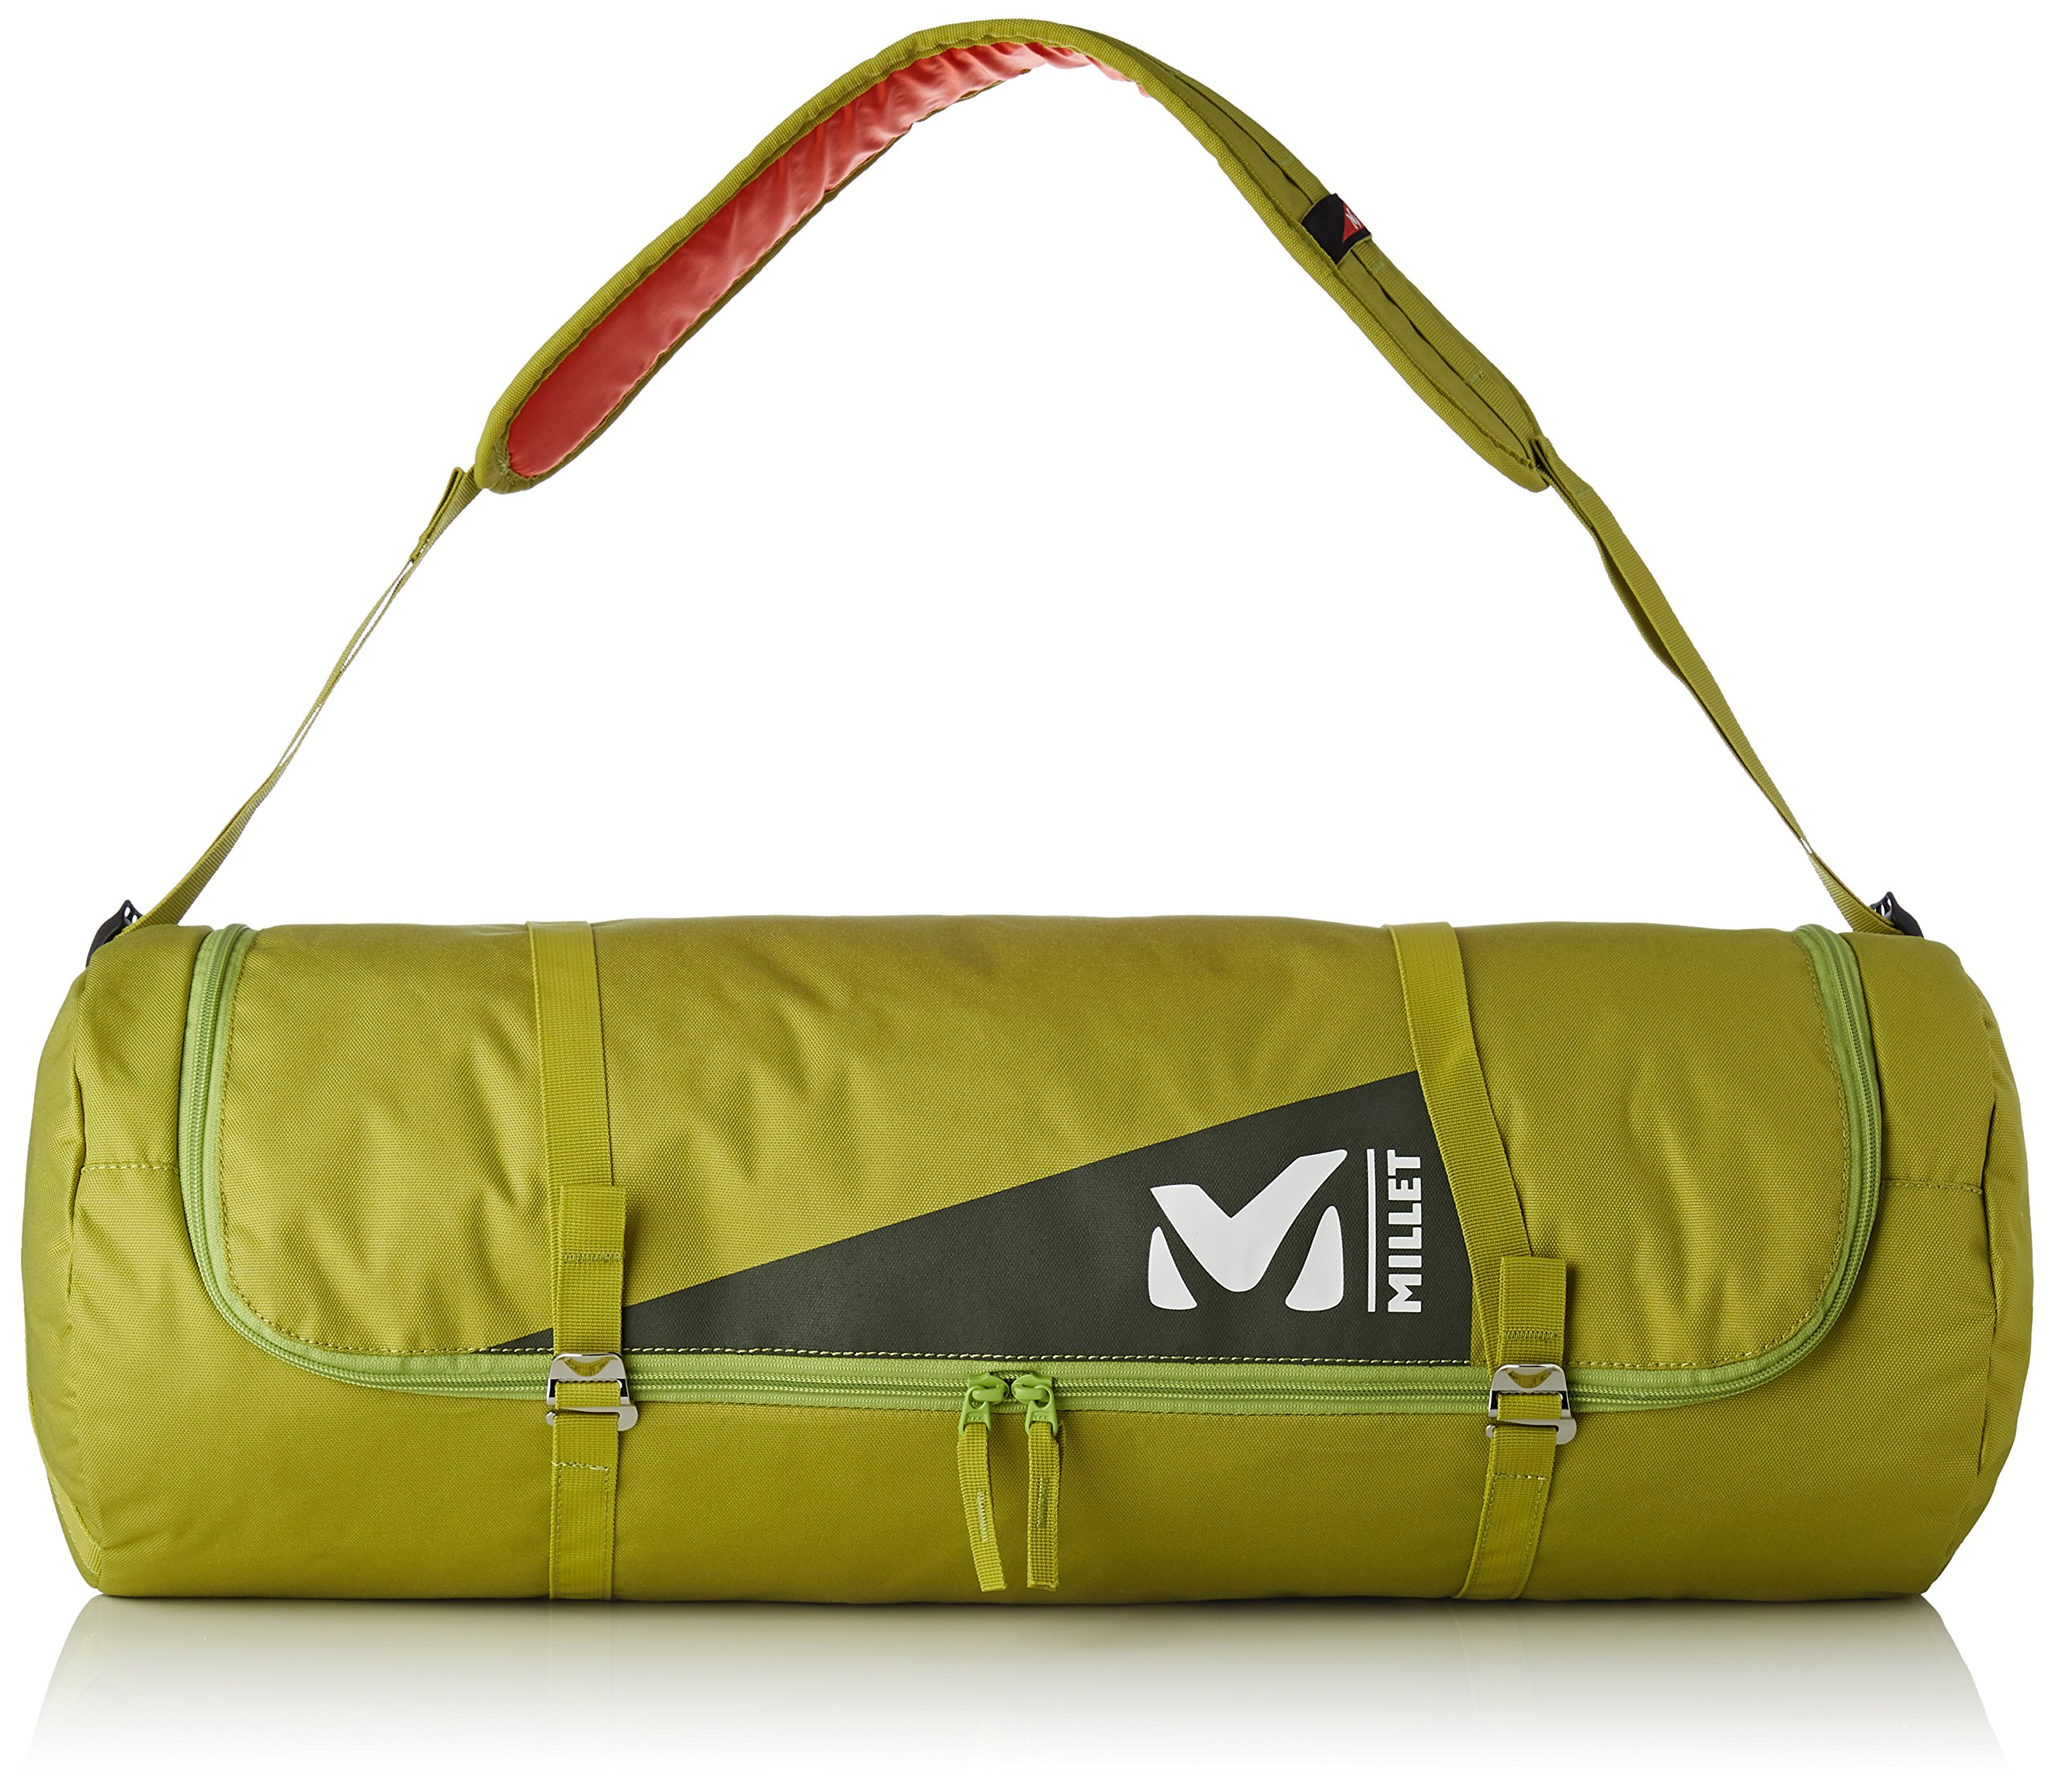 Millet Rope Bag – Bolsa para cuerdas de escalada